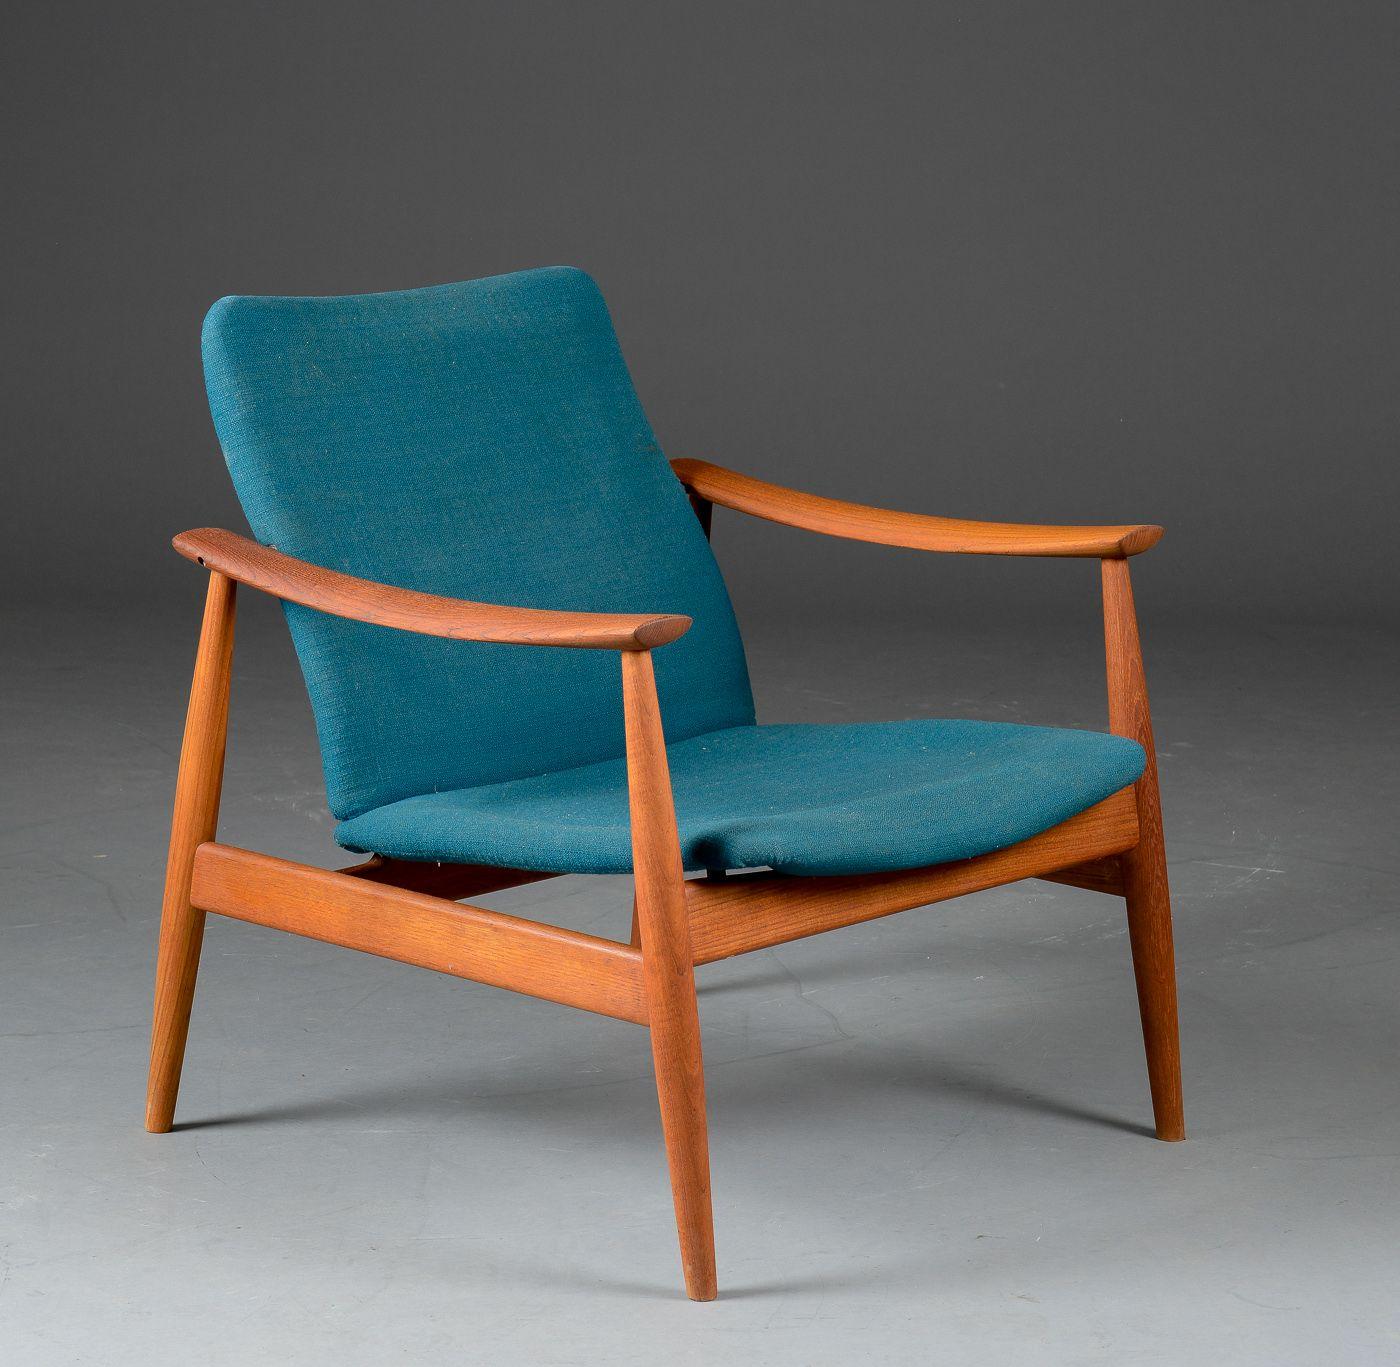 finn juhl 138 france s n denmark 1961 prior. Black Bedroom Furniture Sets. Home Design Ideas